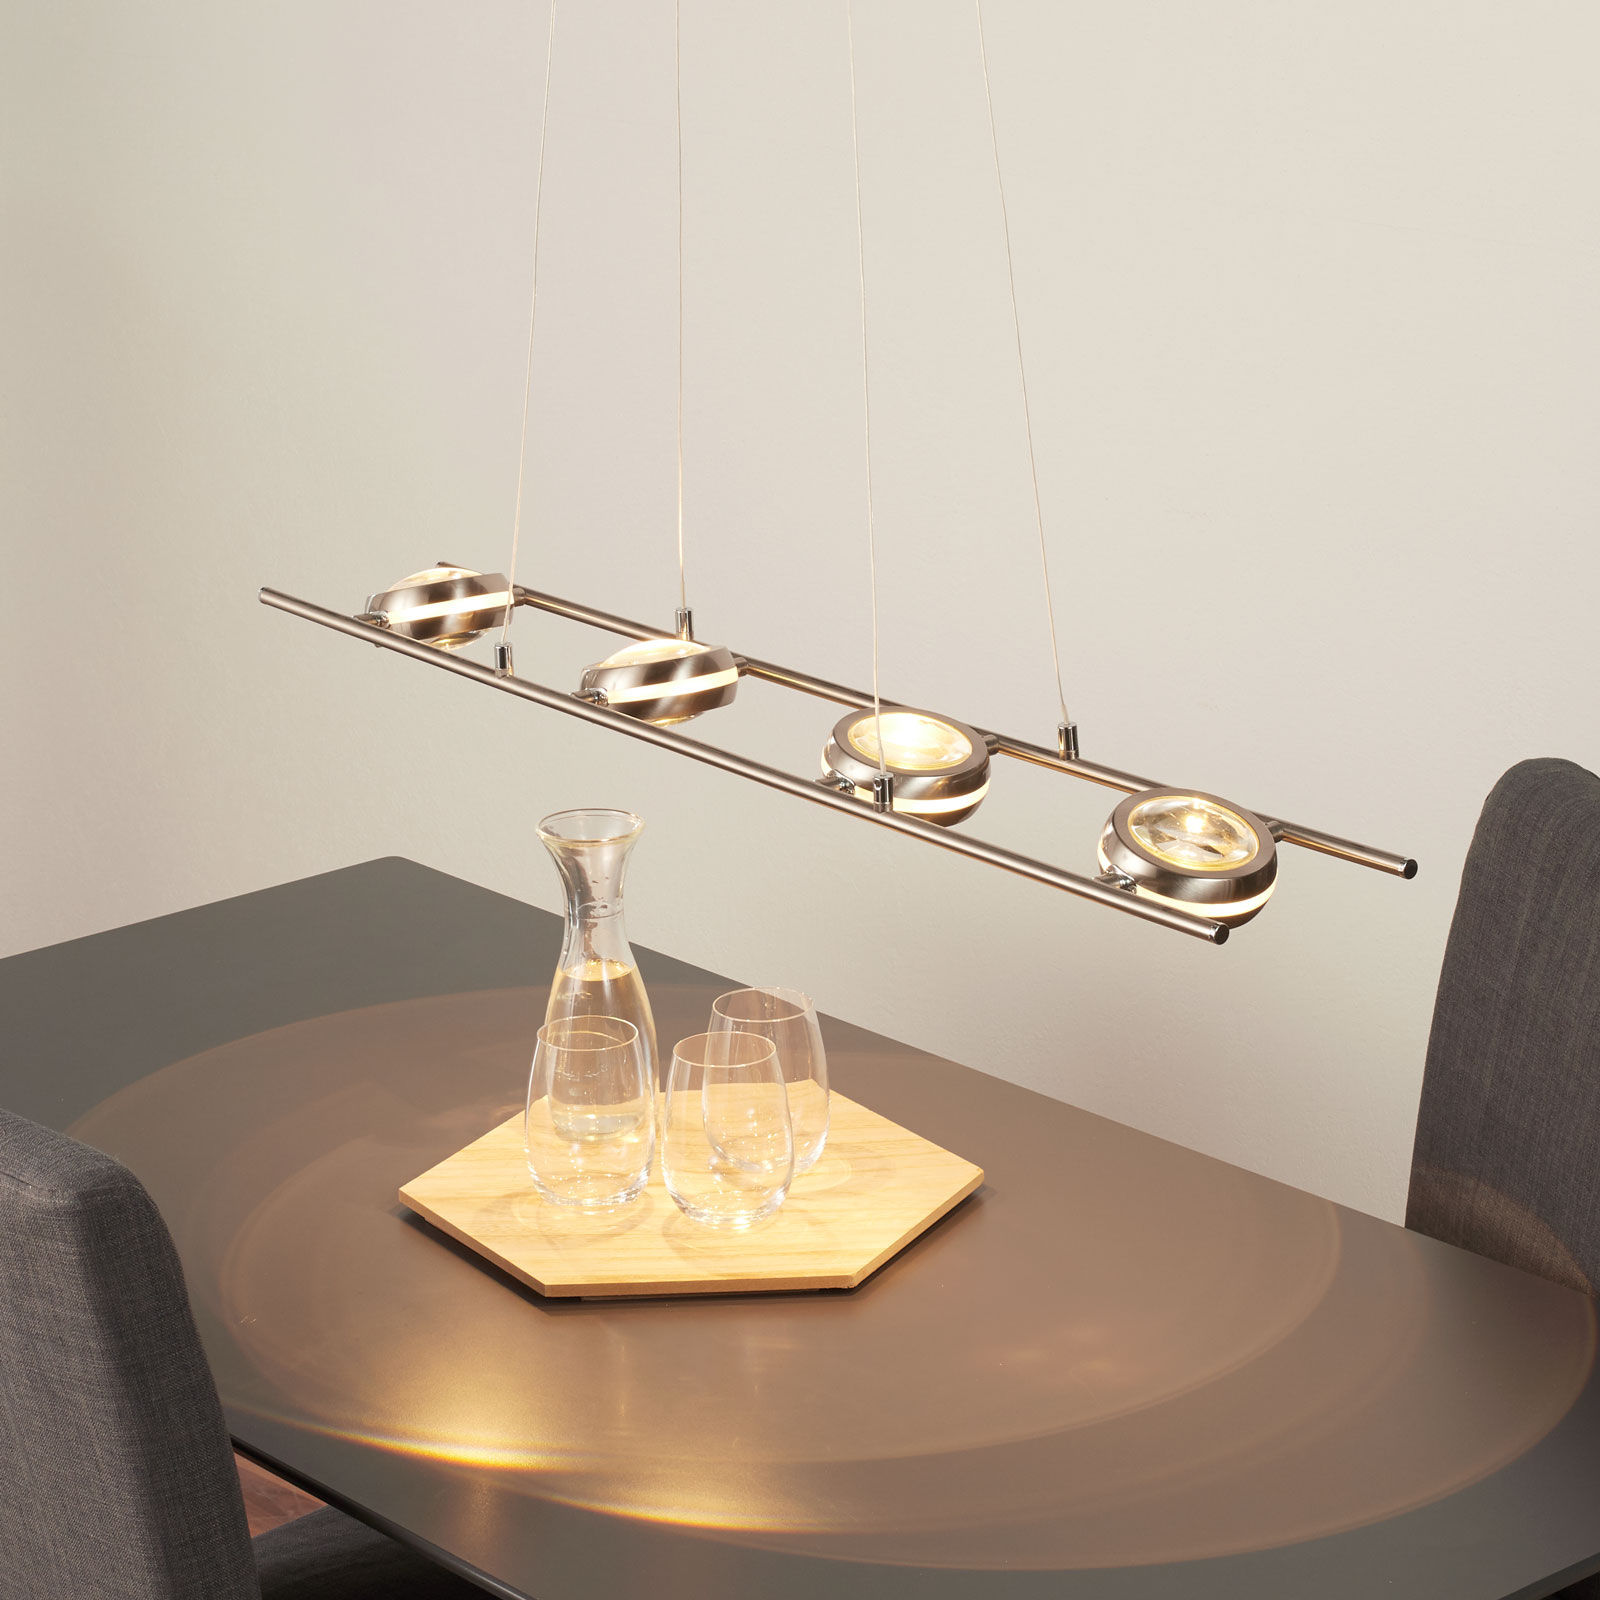 Lampa wisząca LED Samar, 8-punktowa